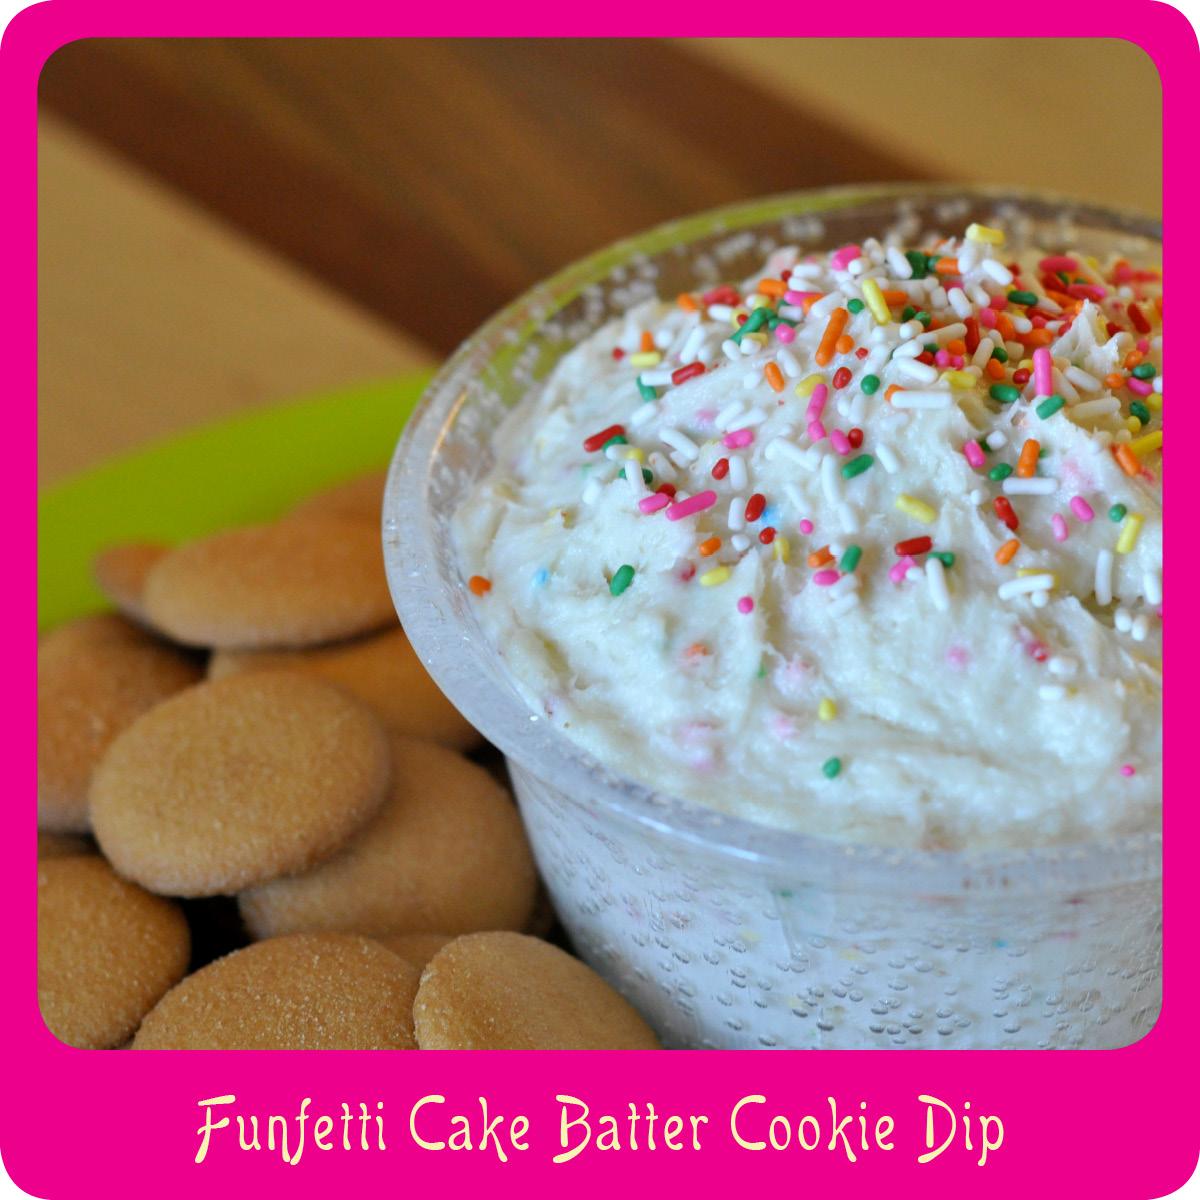 Strange Recipefunfetti Cake Batter Cookie Dip Funny Birthday Cards Online Drosicarndamsfinfo